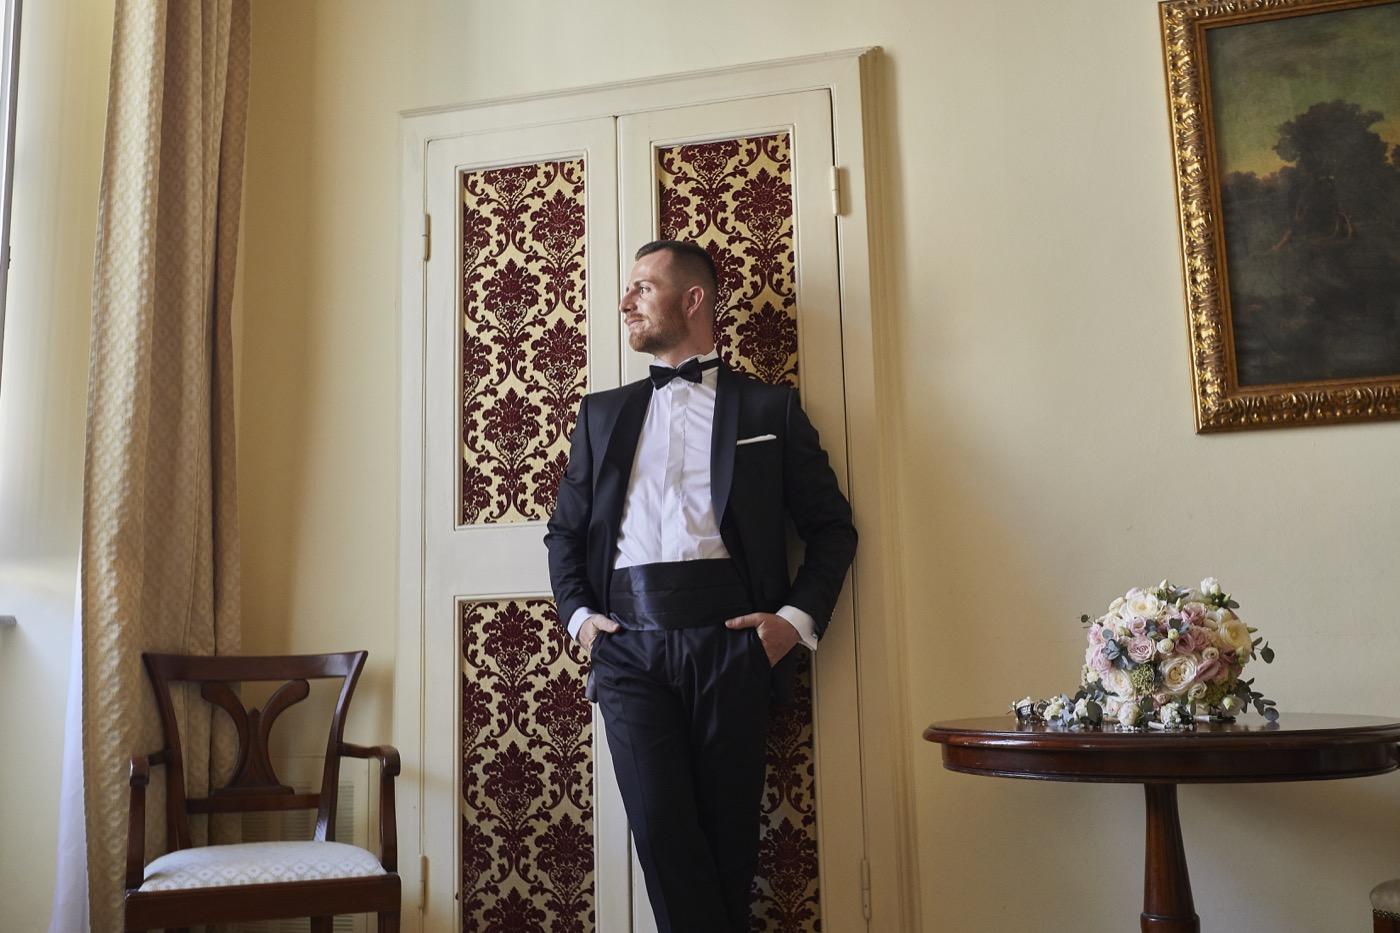 Claudio-Coppola-wedding-photographer-la-scuderia-eventi-preparativi-la-rosetta-perugia-10